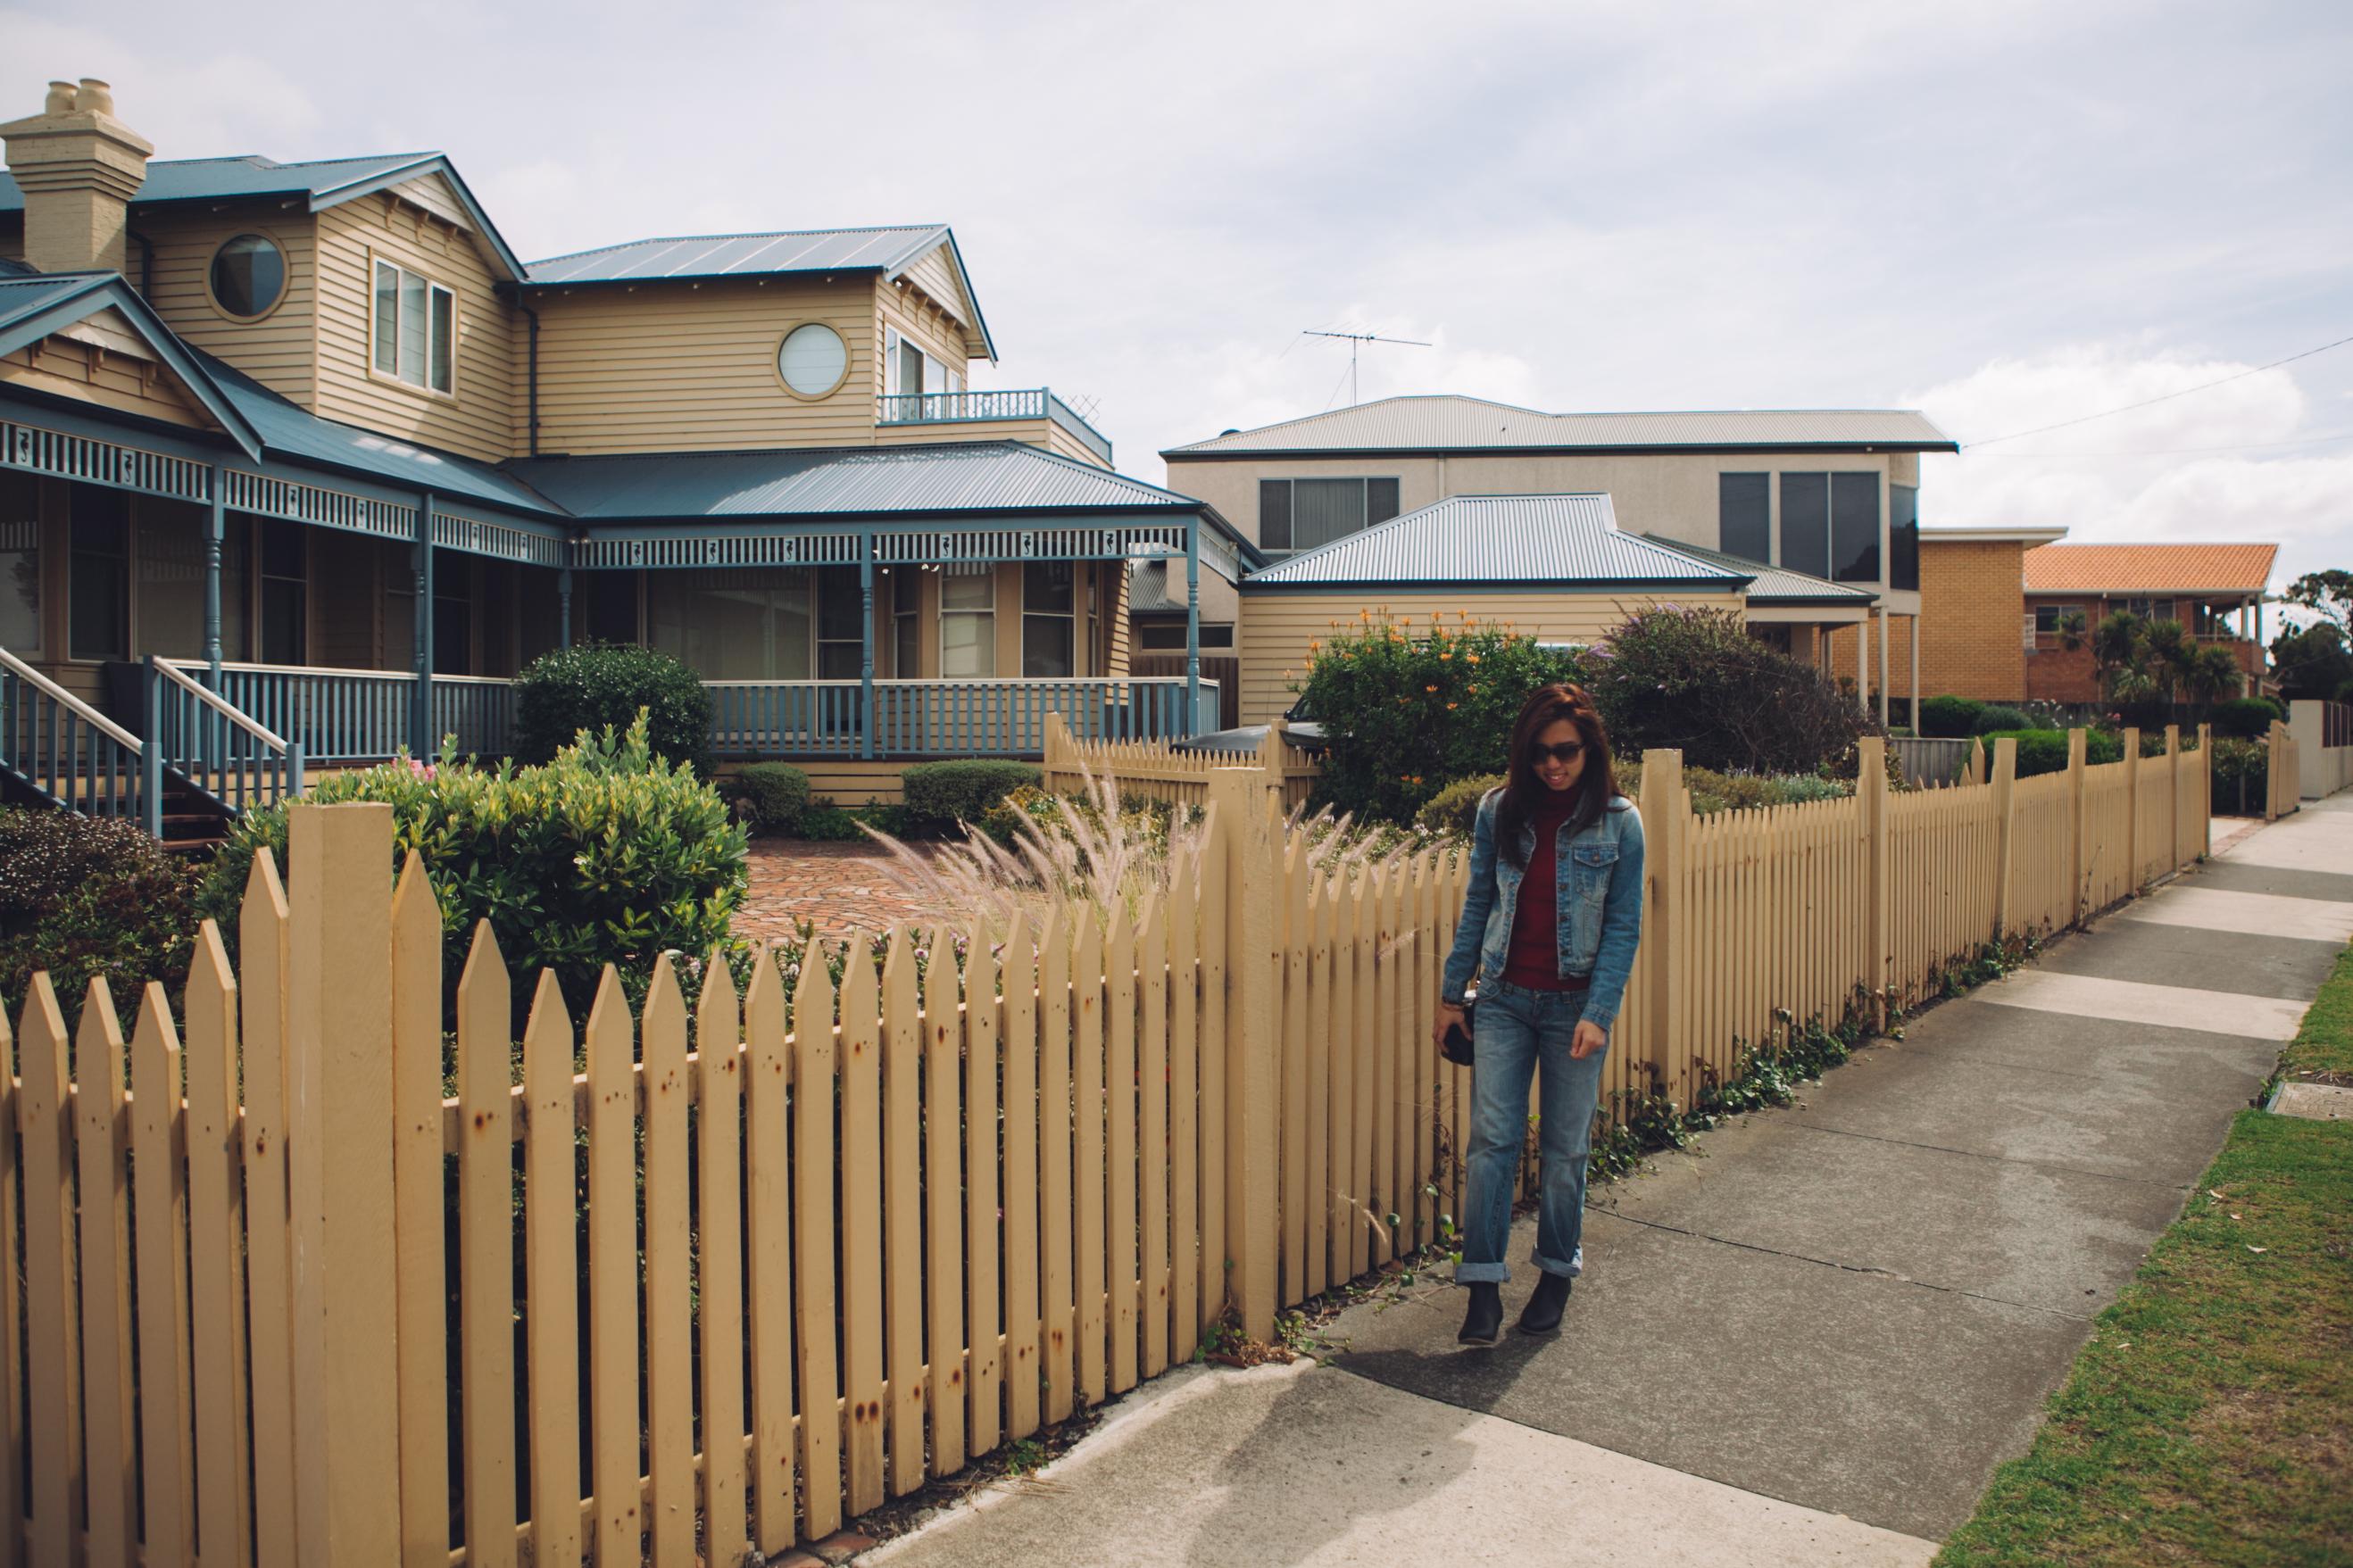 Melbourne2 (6)a